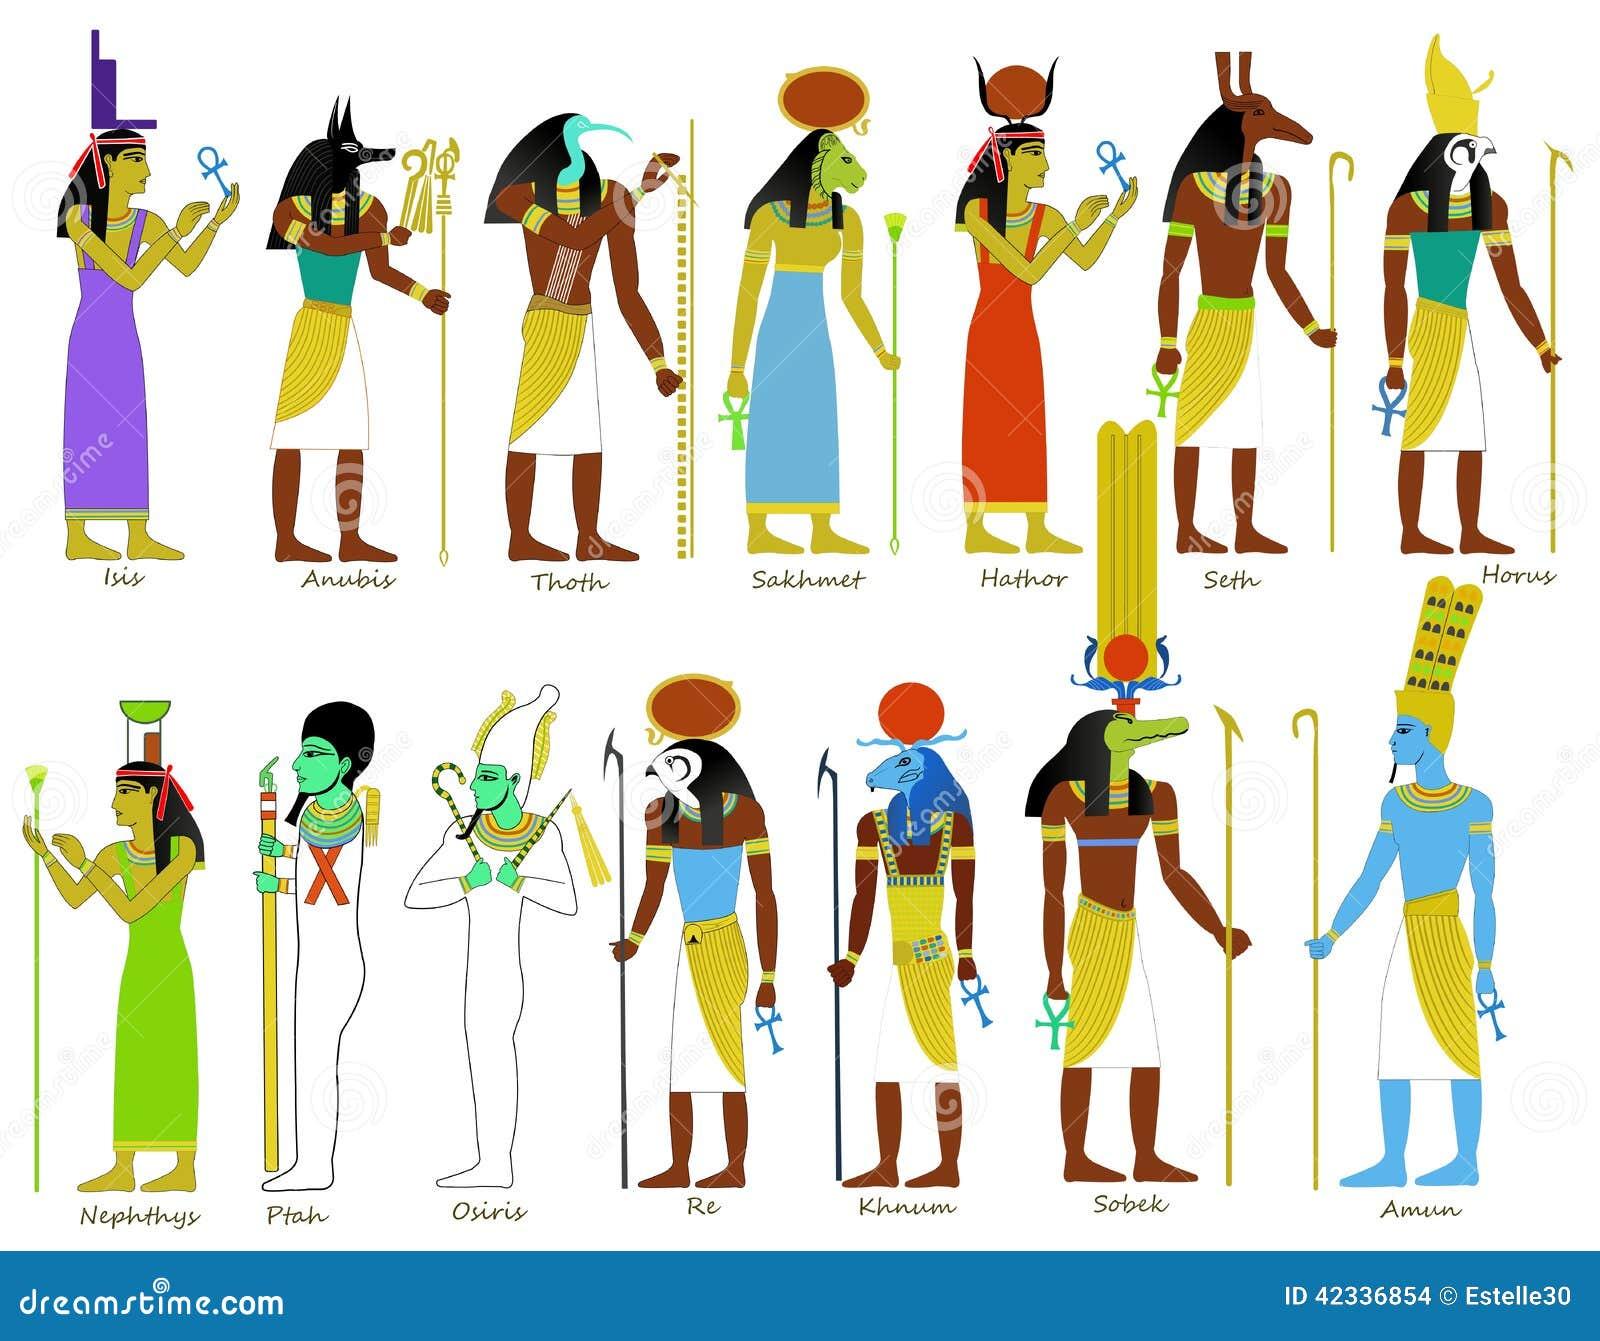 Un sistema de dioses egipcios antiguos